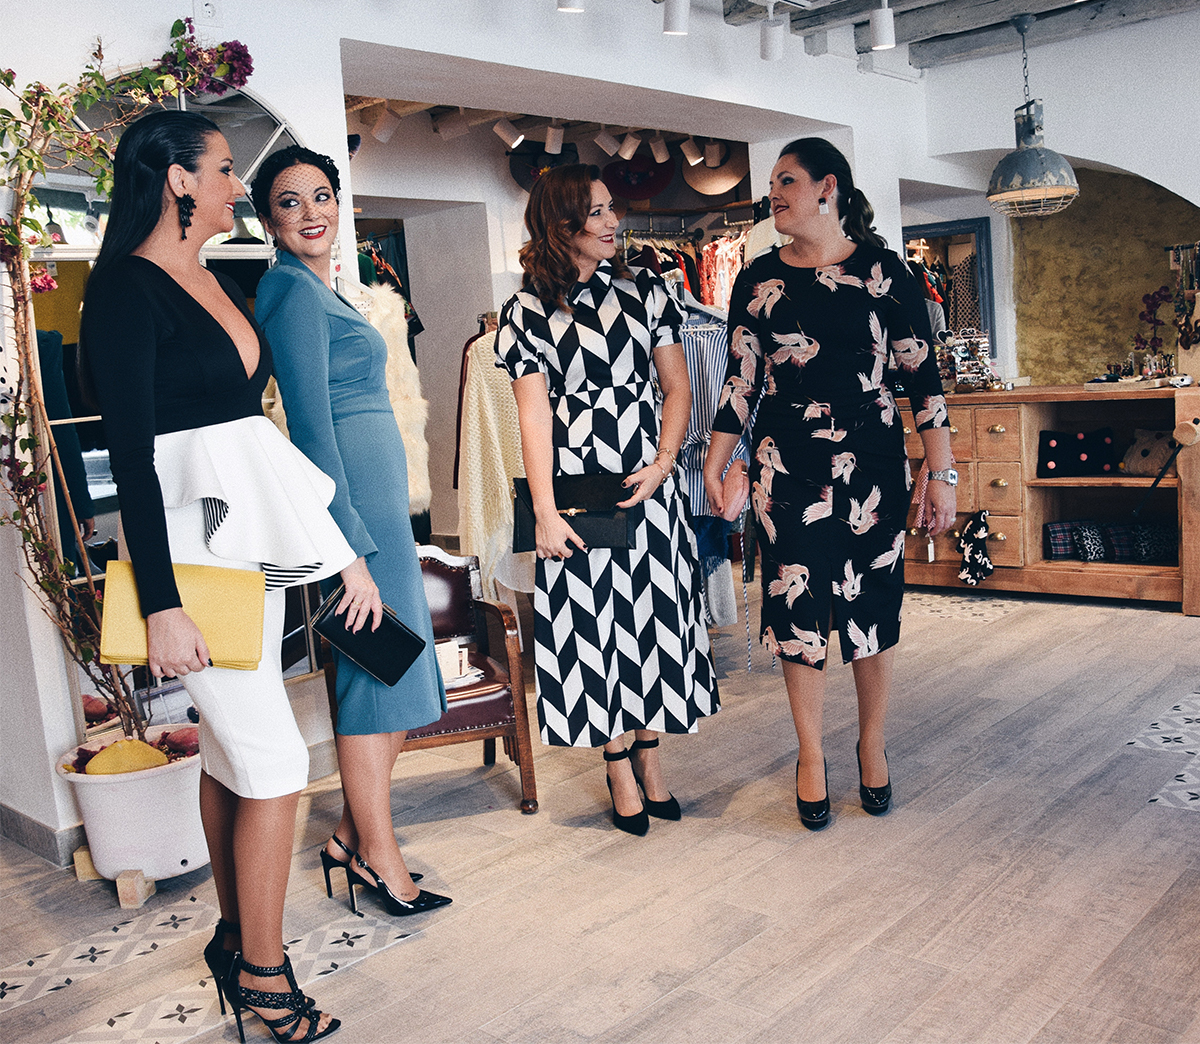 a7665aa59 Cuatro vestidos para bodas de otoño - Blog de Mariquita Trasquila